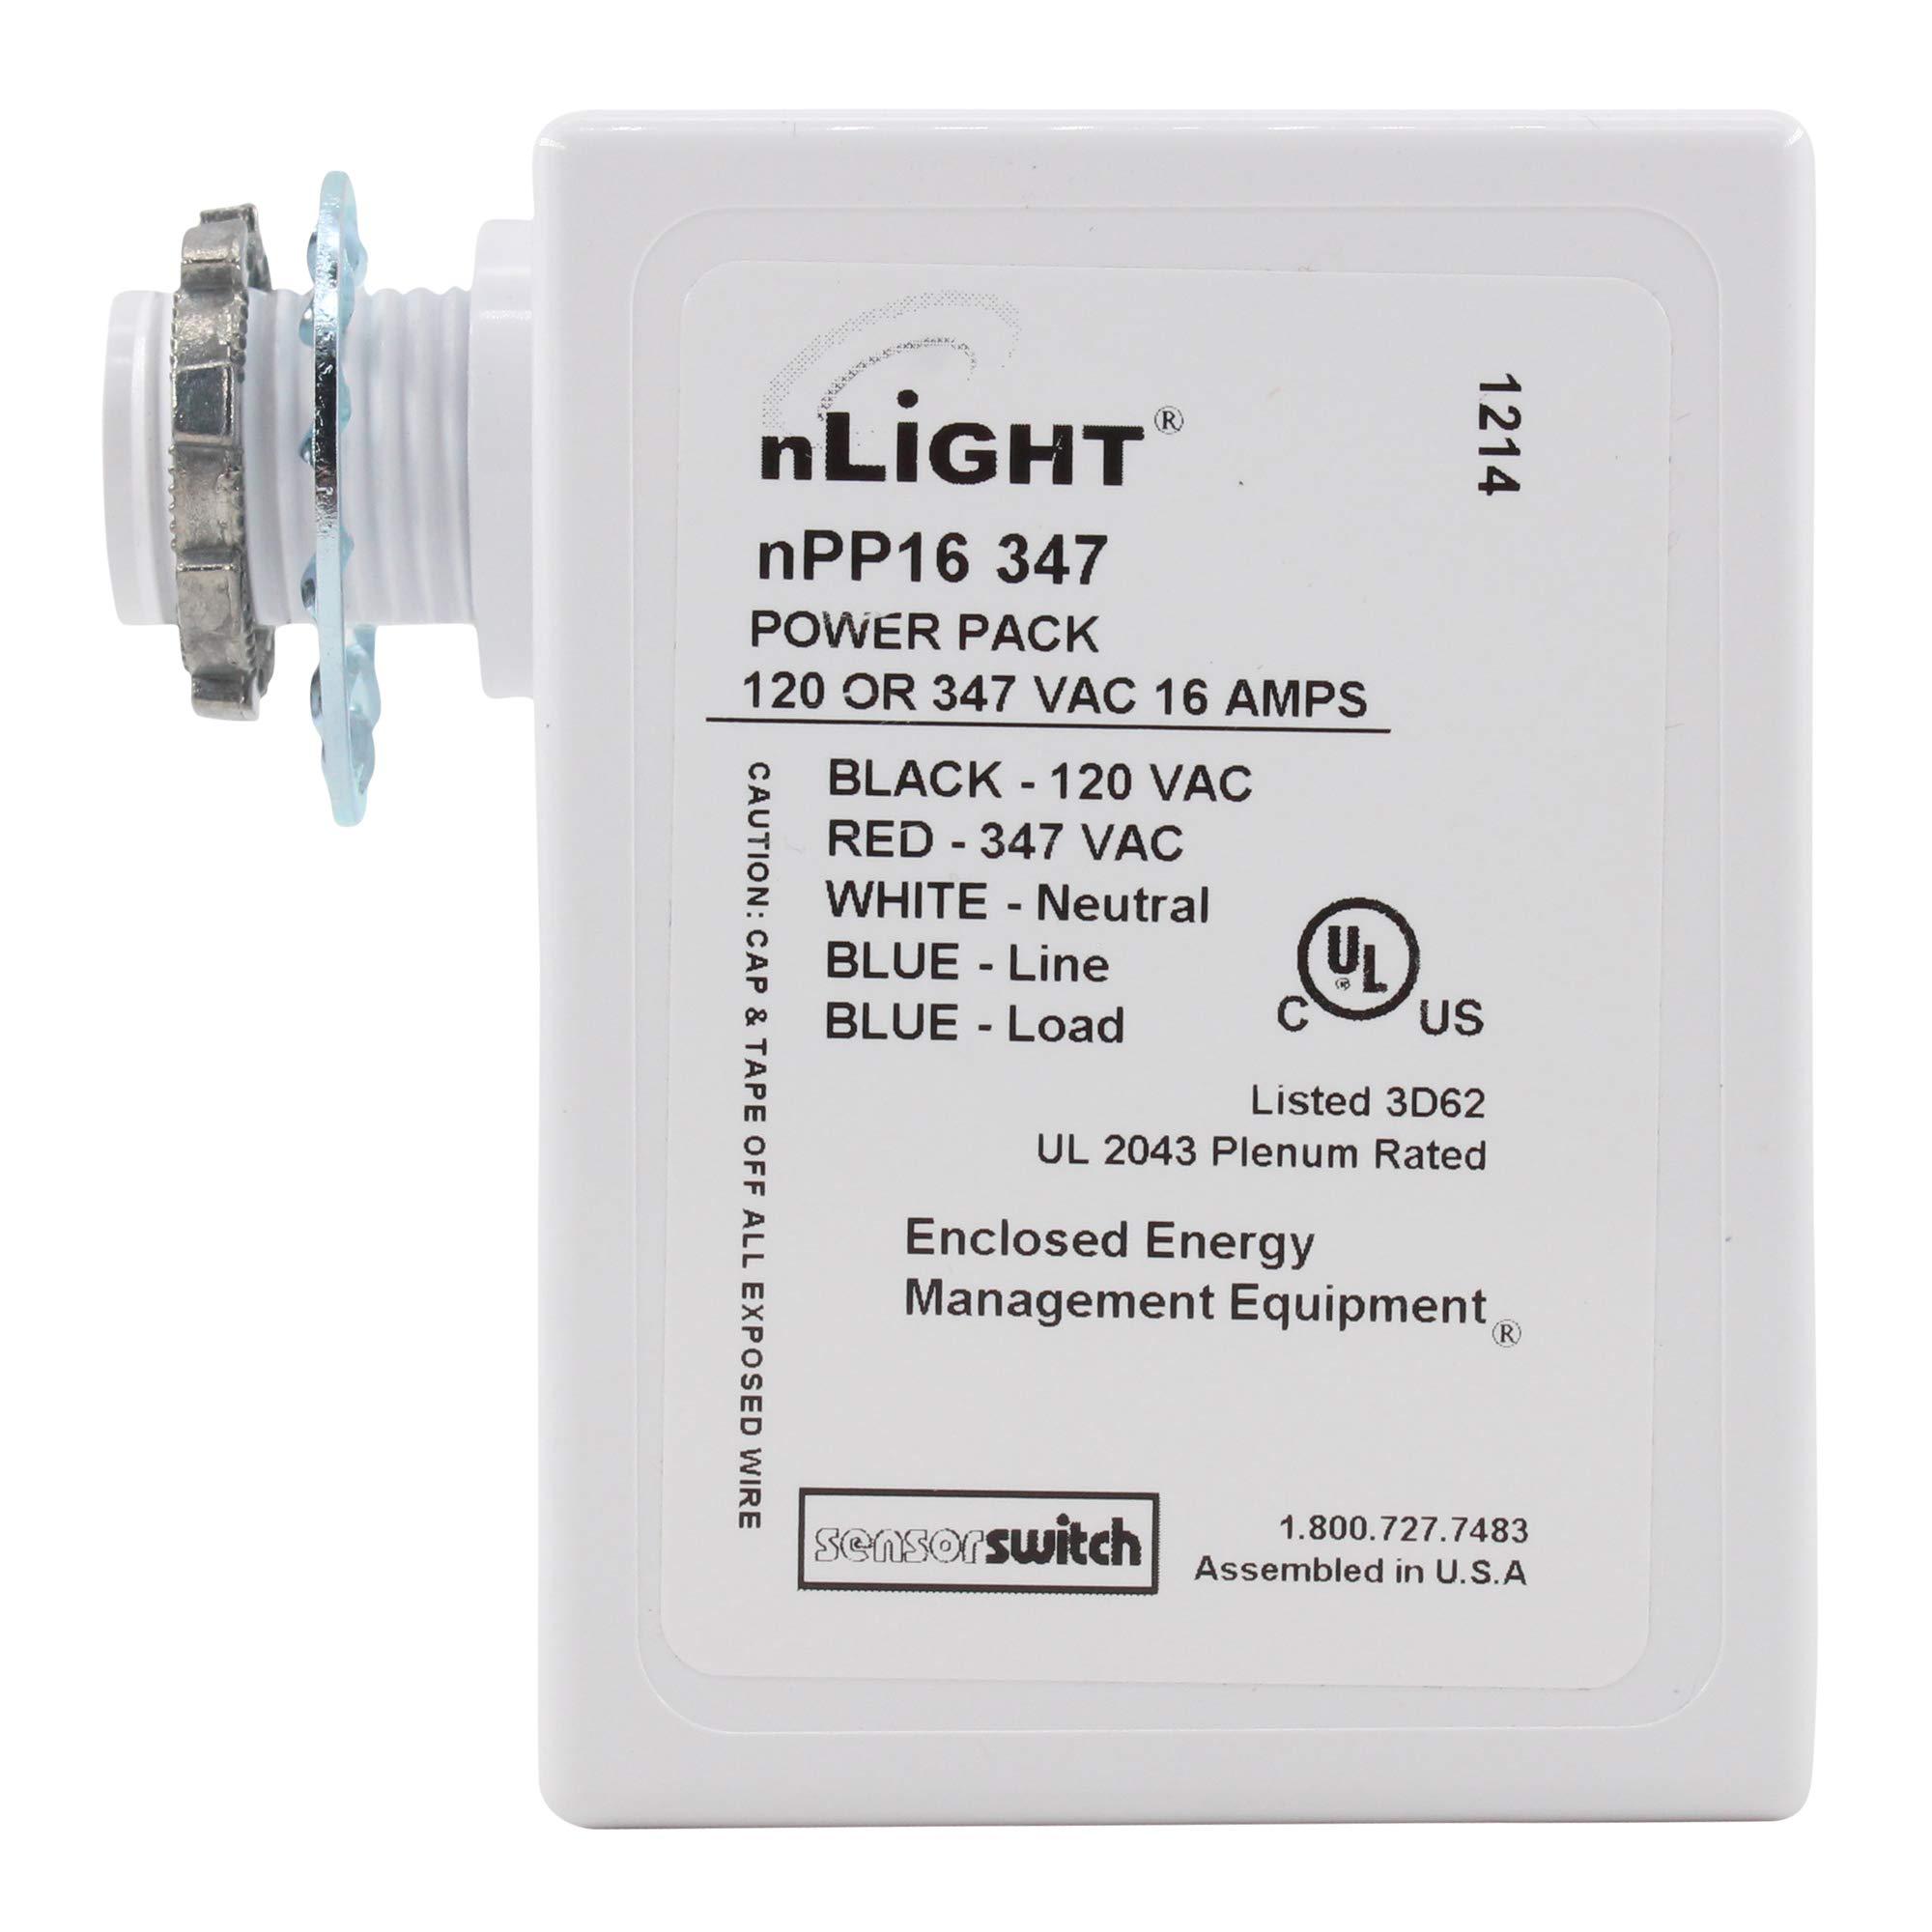 Sensor Switch NPP16-347 nLIGHT Occupancy Sensor Power Pack, Plenum, 16A, 347V